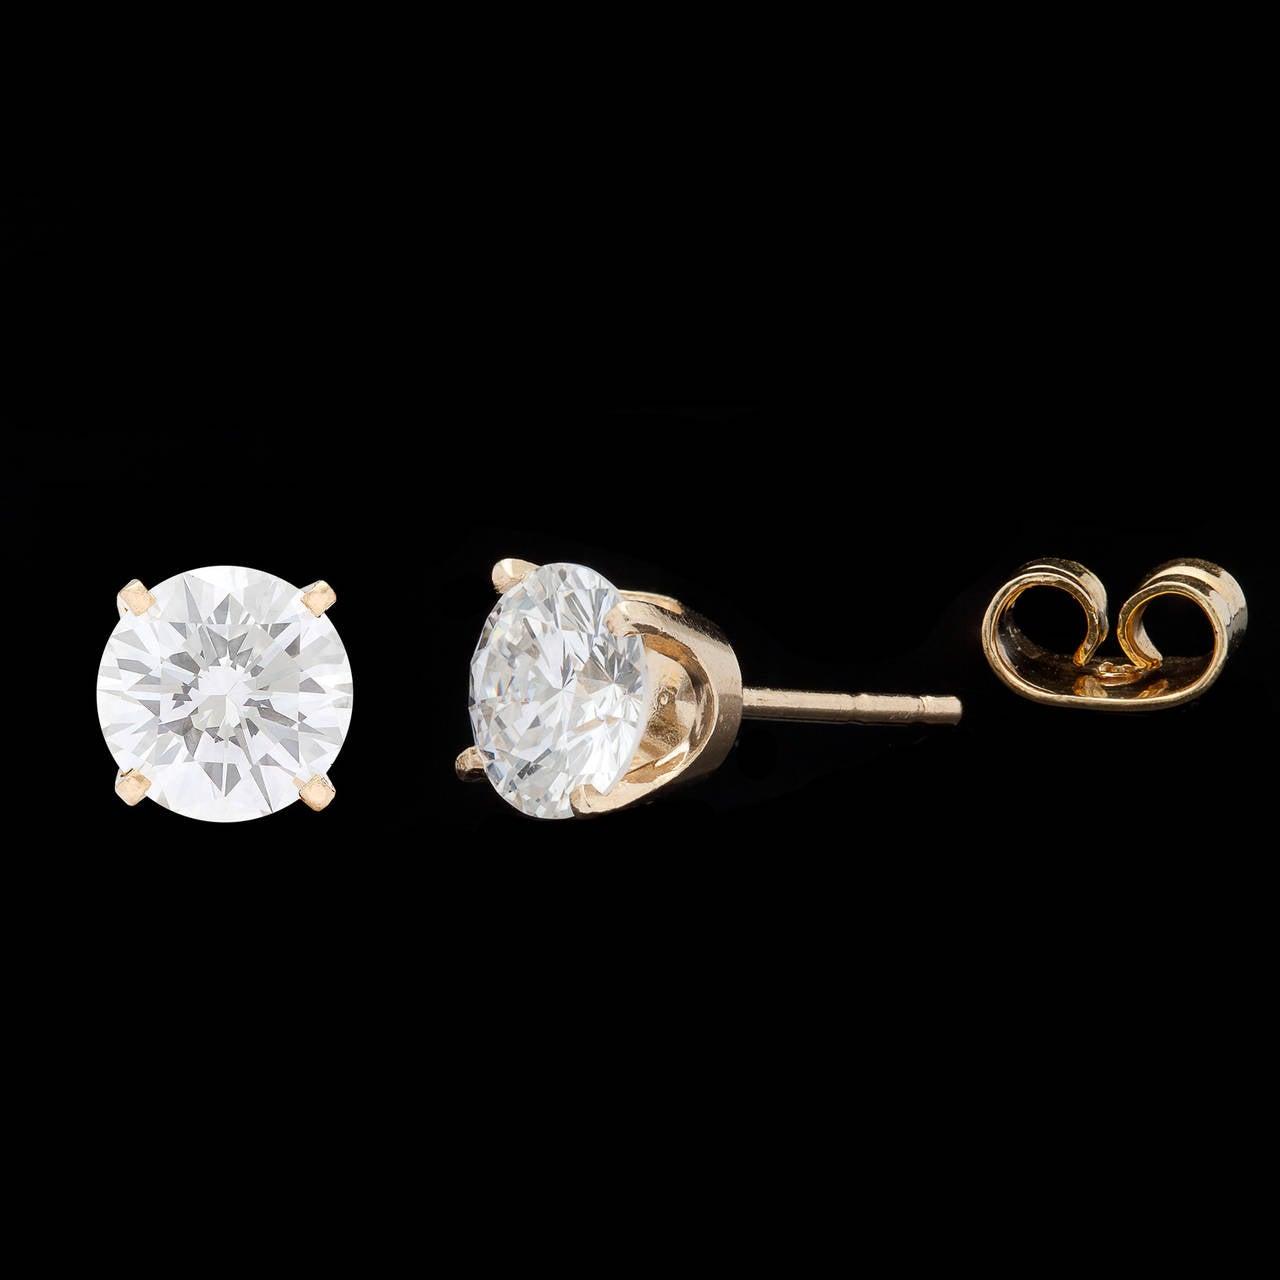 2.04 Carat GIA Cert Round Brilliant Cut Diamond Gold Earrings 3